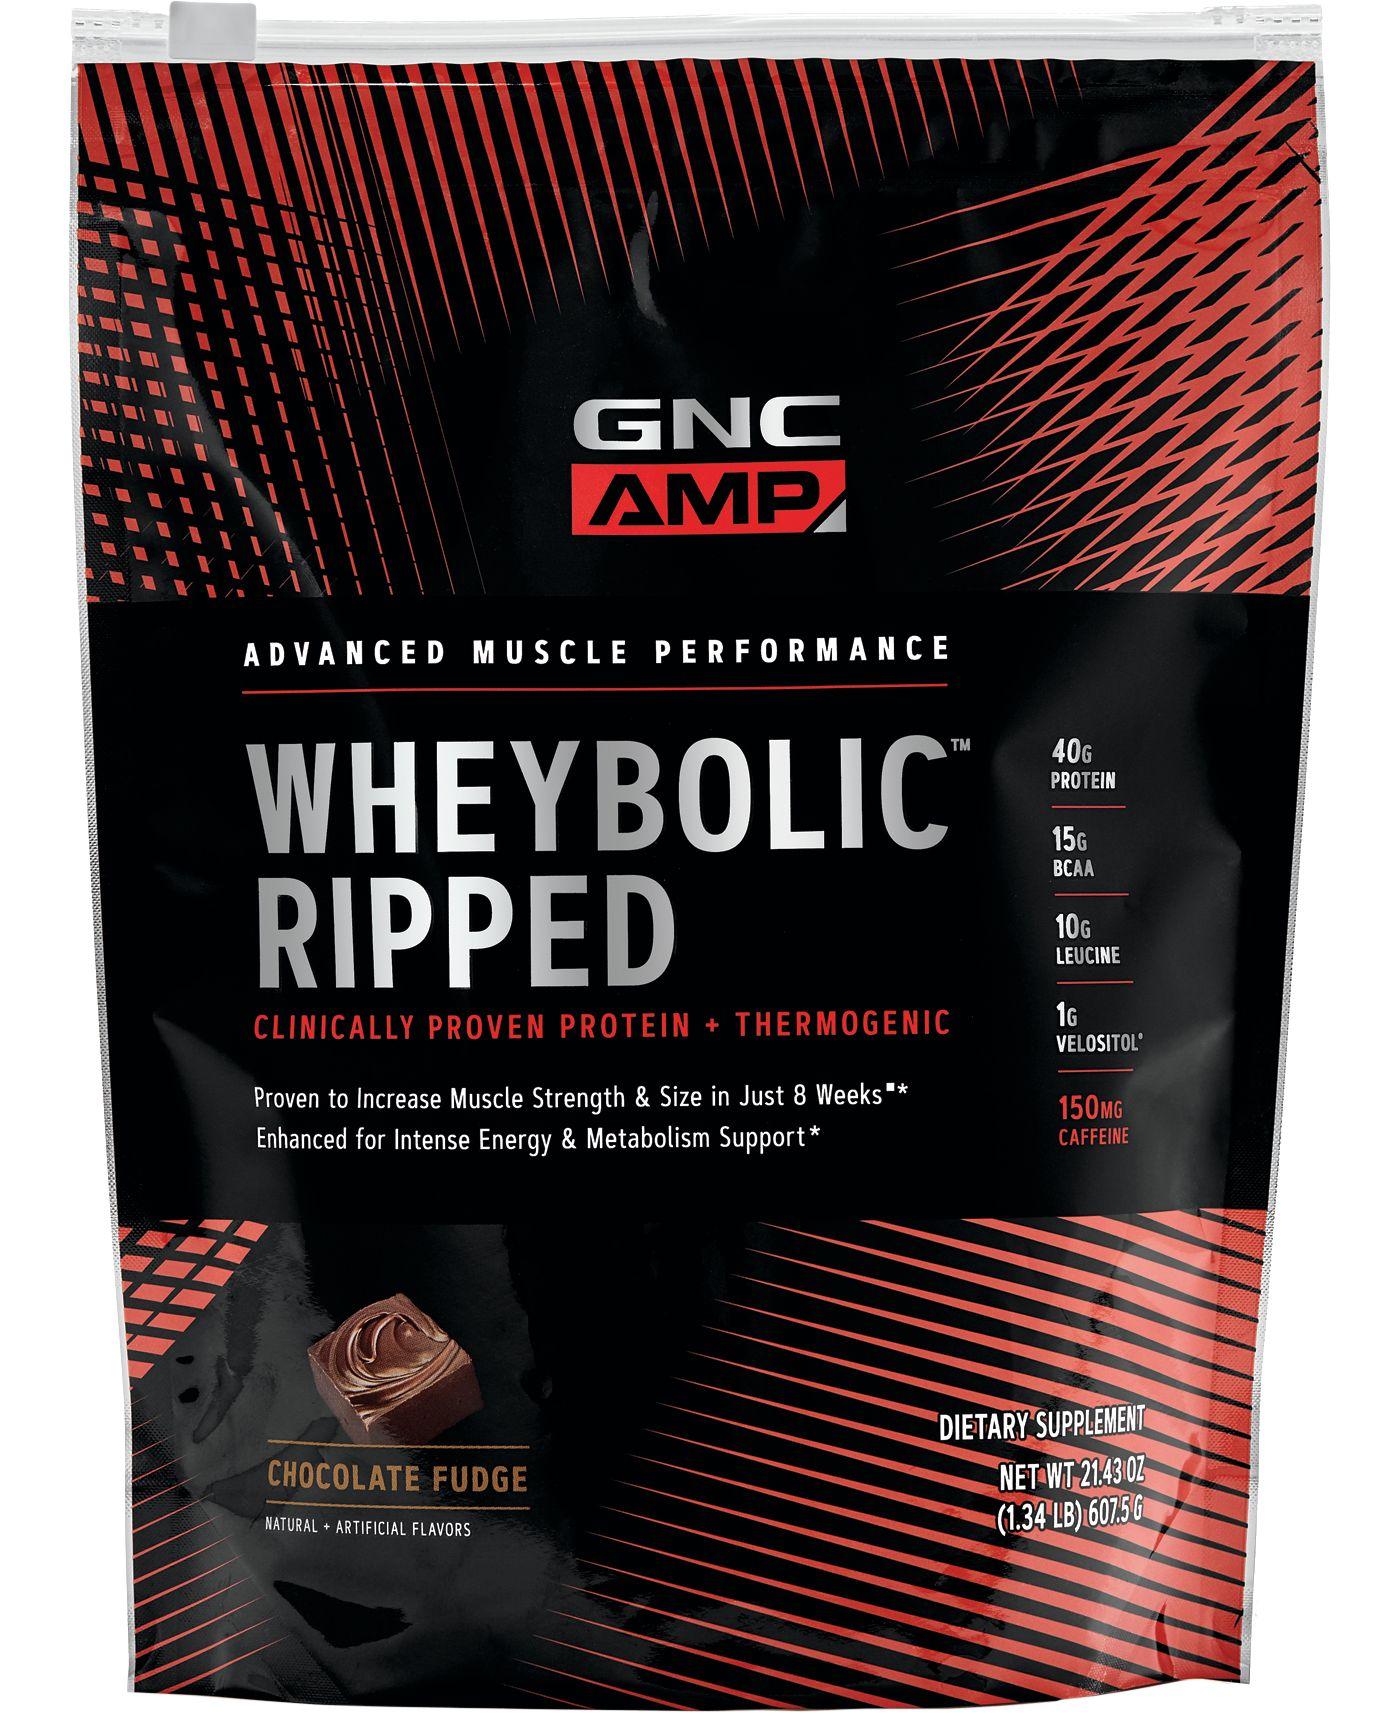 GNC AMP Wheybolic Ripped Protein Chocolate Fudge 9 Servings